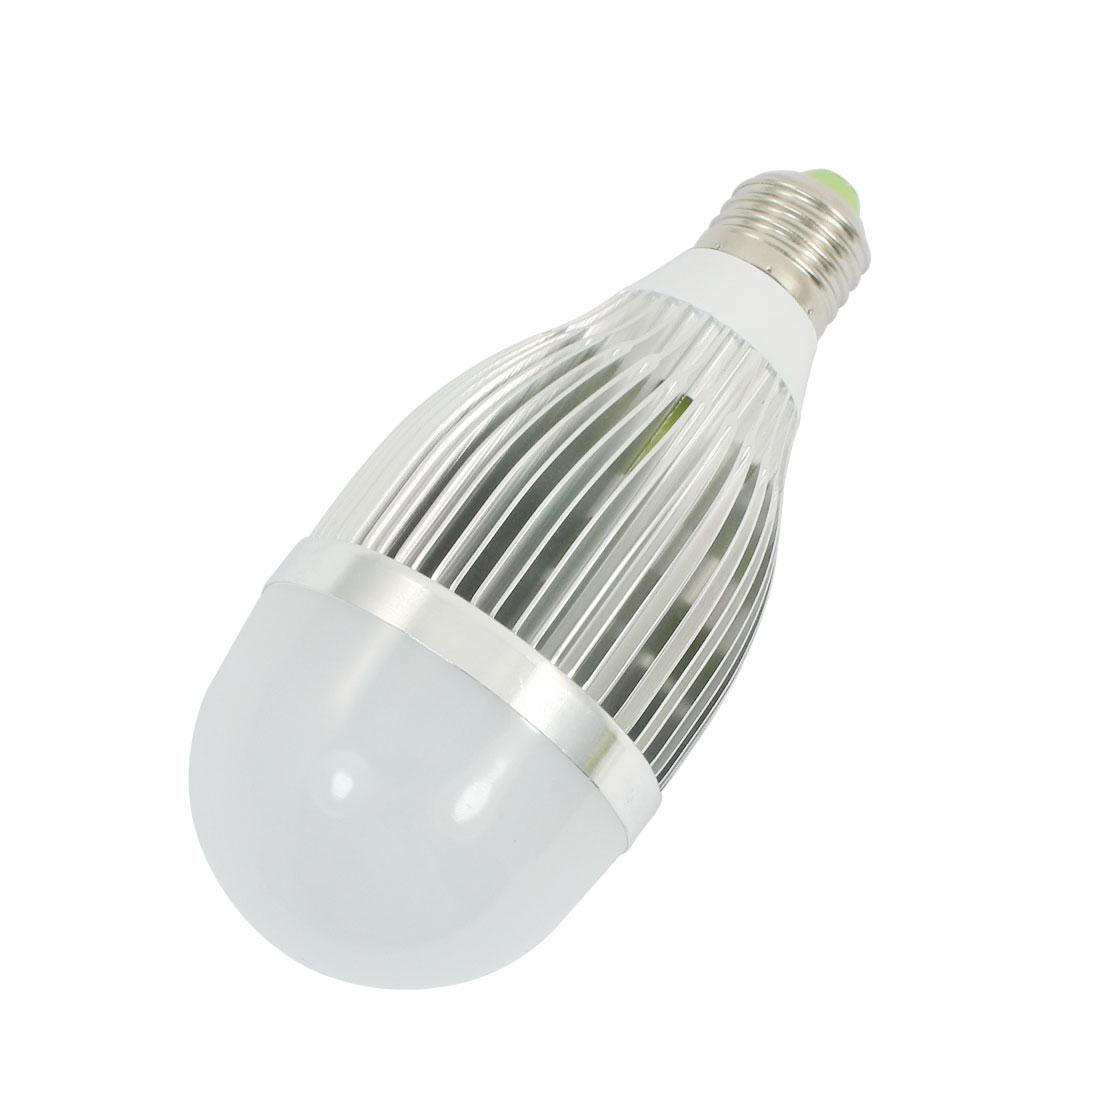 Household E27 Base 2.6cm Screw Dia 6000-6500K 900Lm White 9W 9 x 1W LEDs SMD Globe Ball Light Lamp AC 85-265V